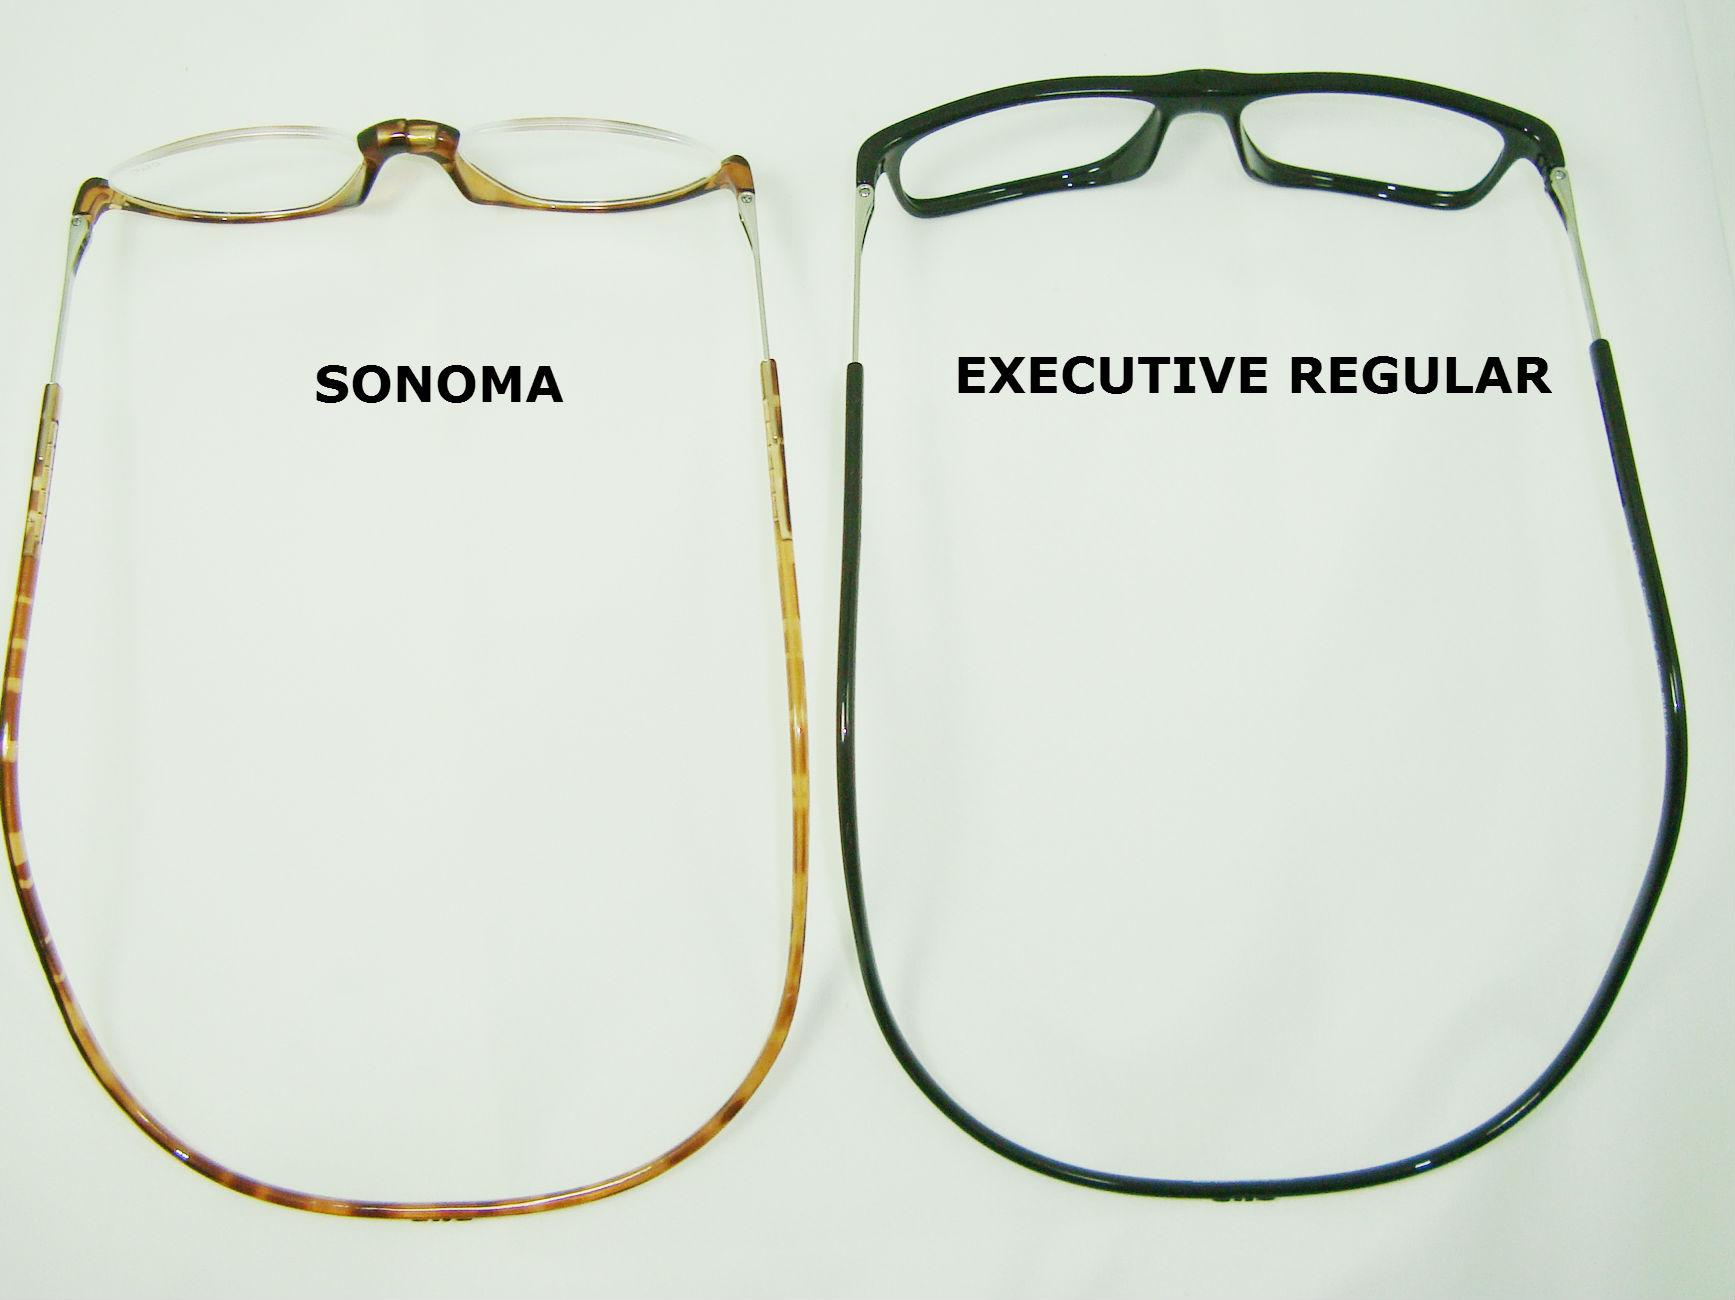 SONOMA & EXECUTIVE WEB